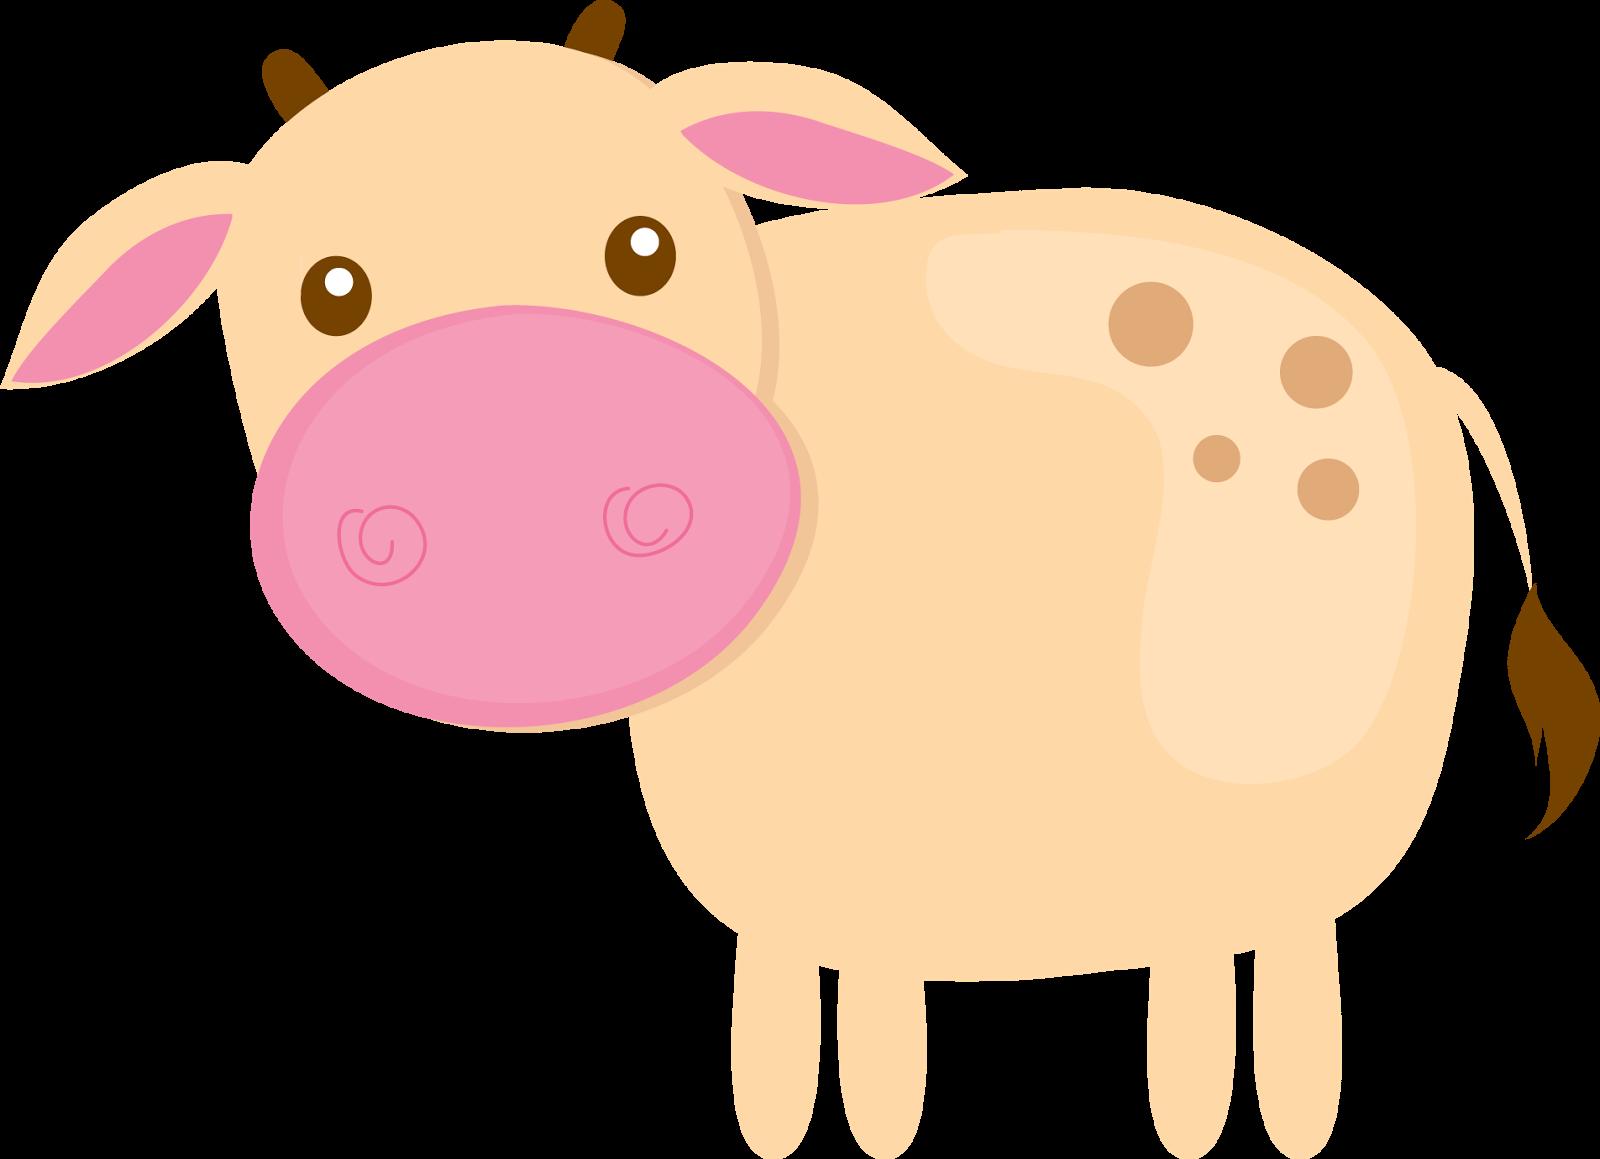 Farmer clipart livestock farming. Cow farm granja png